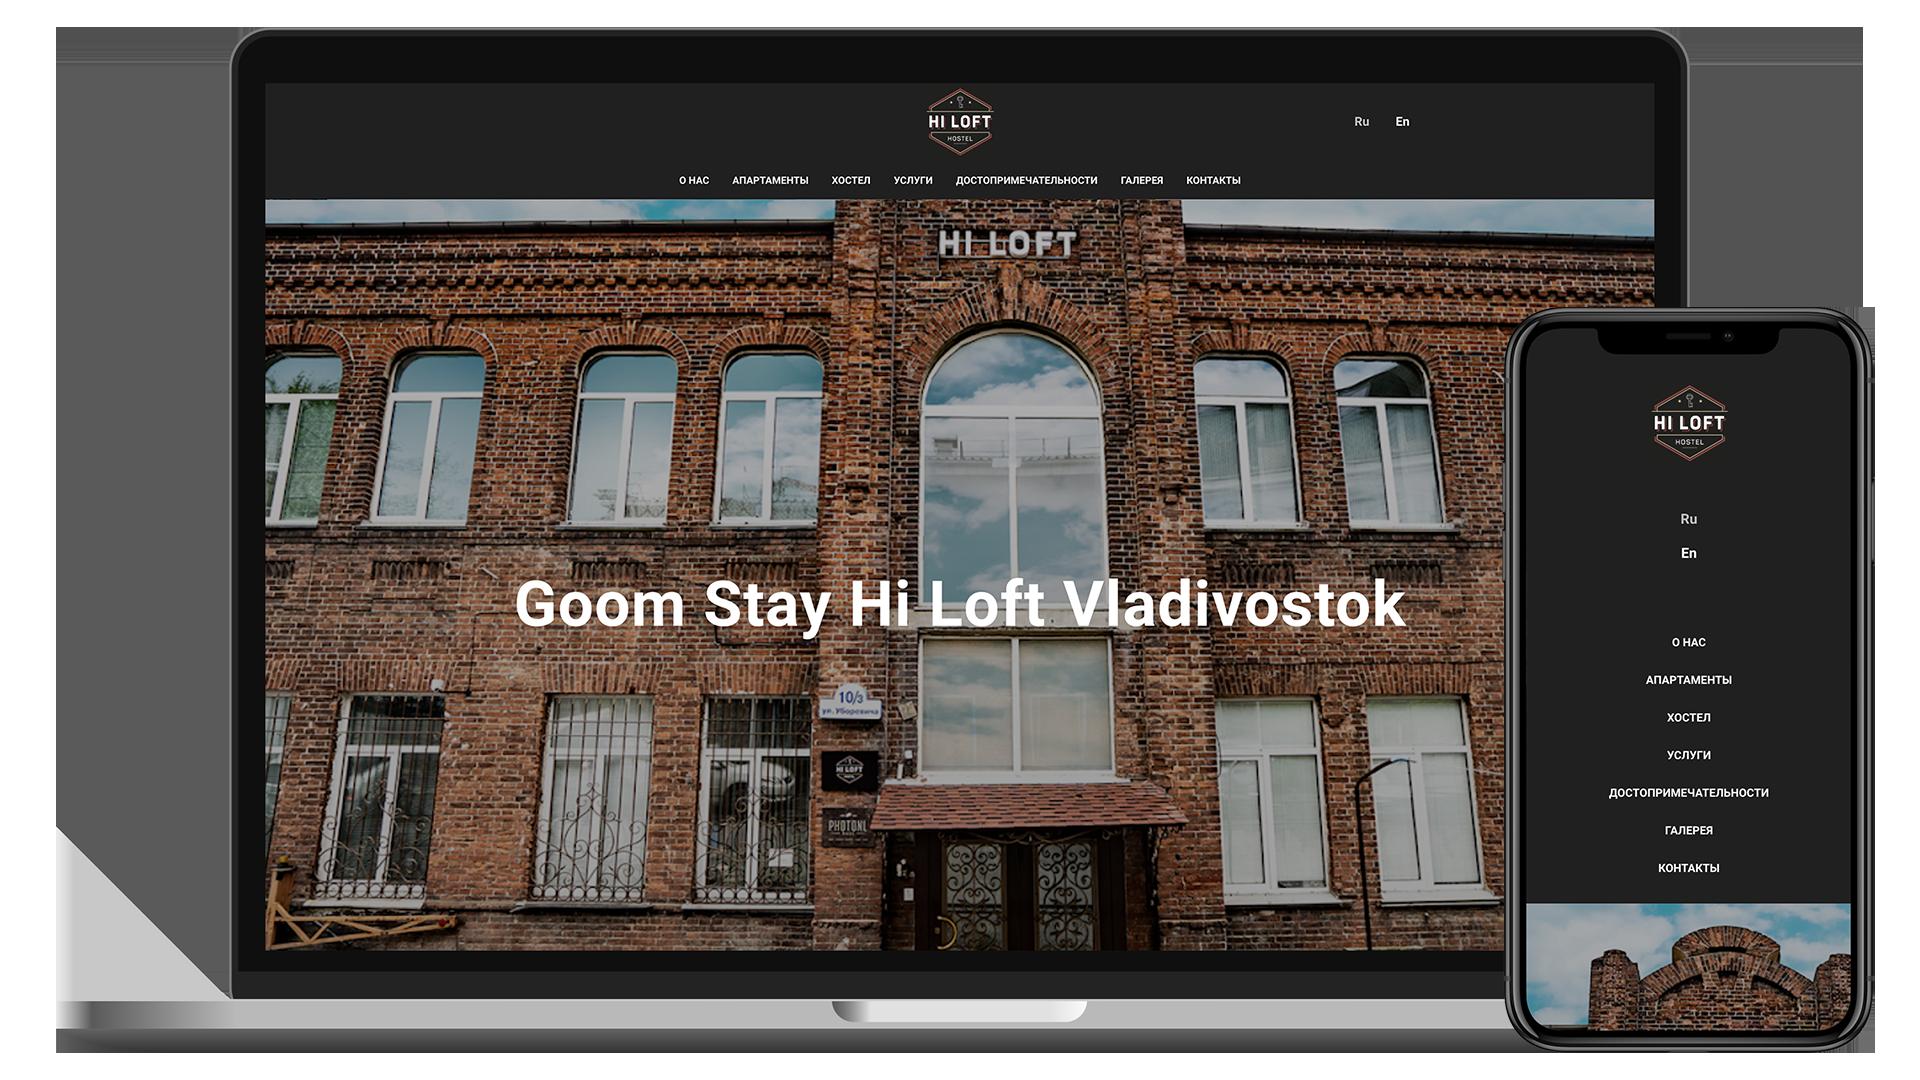 Goom Stay Hi Loft Vladivostok